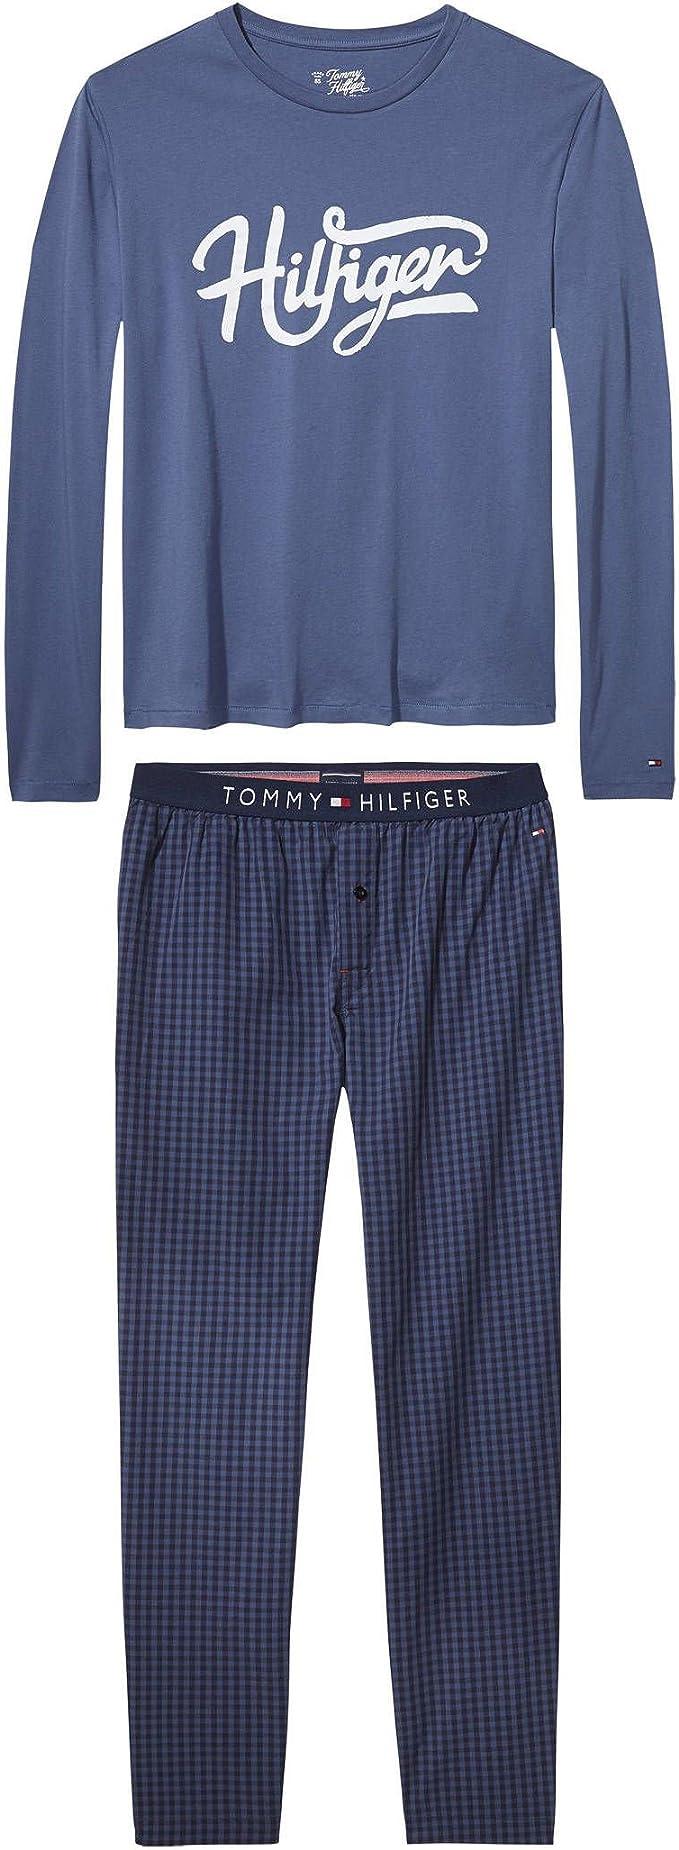 Tommy Hilfiger Flag Set Gingham LS Pijama para Hombre ...